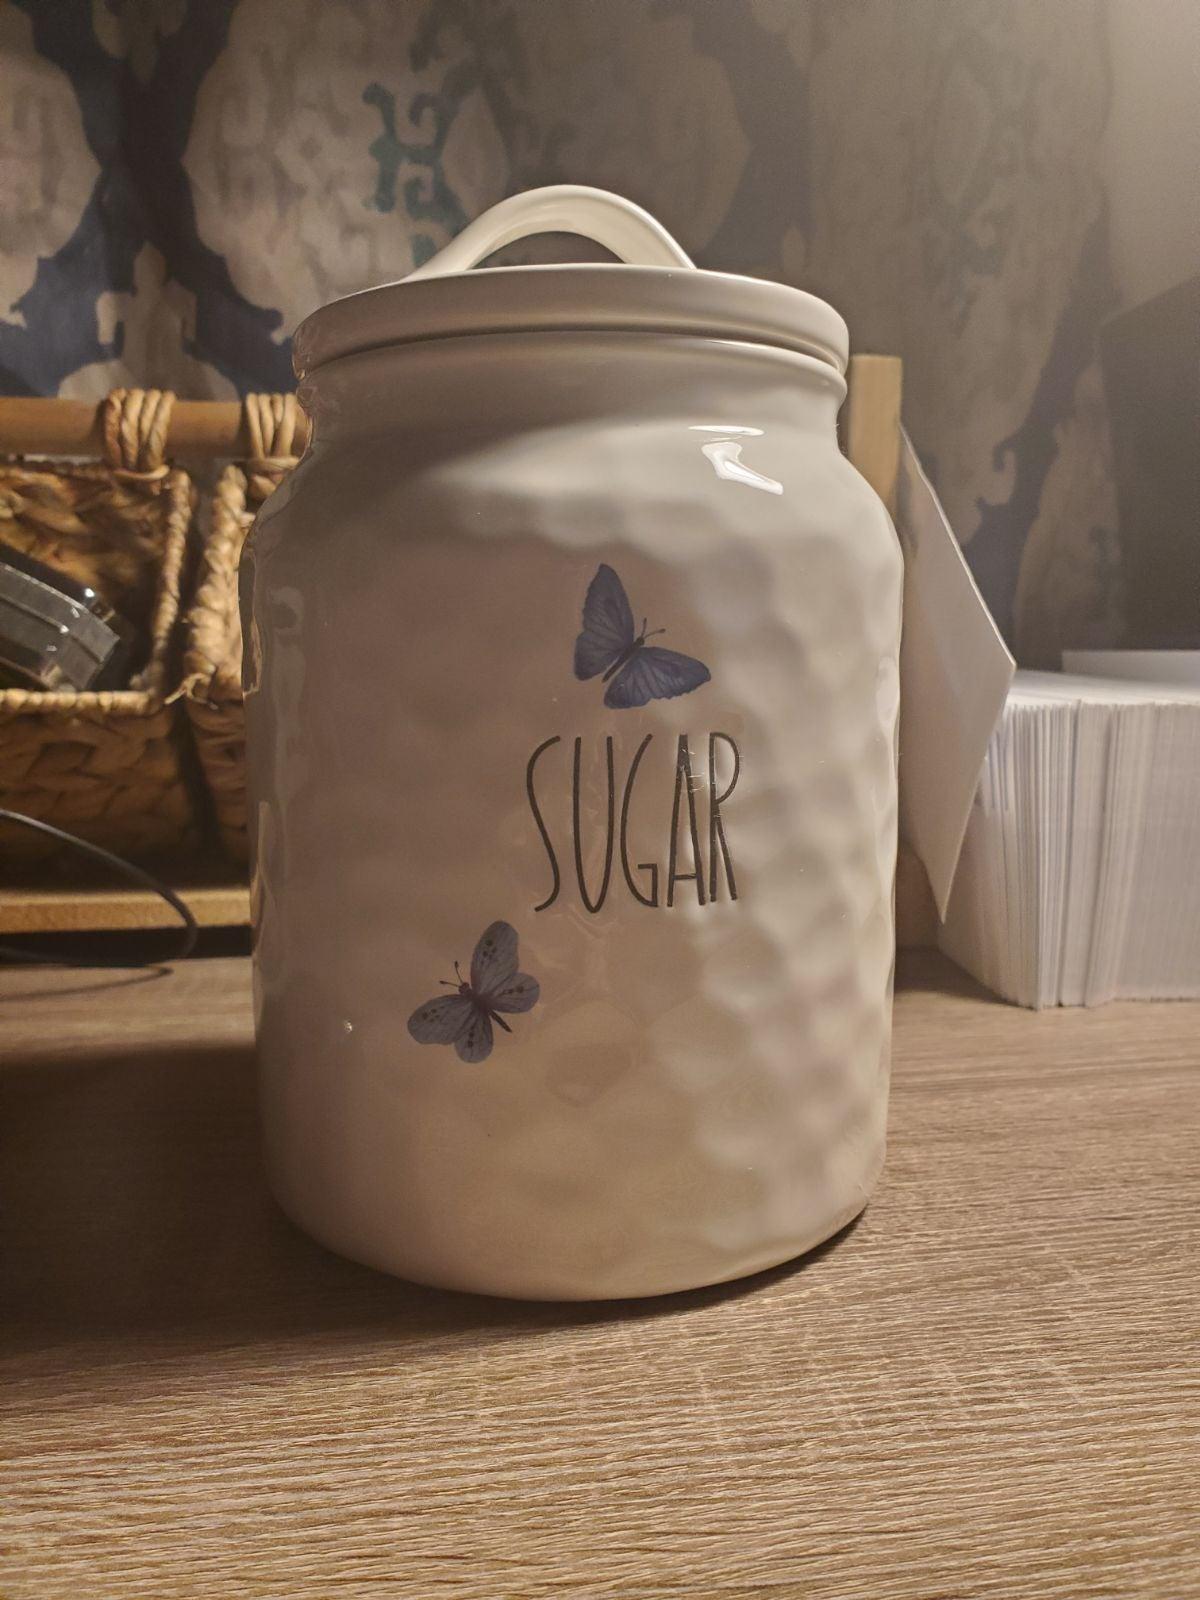 Large Sugar Cannister